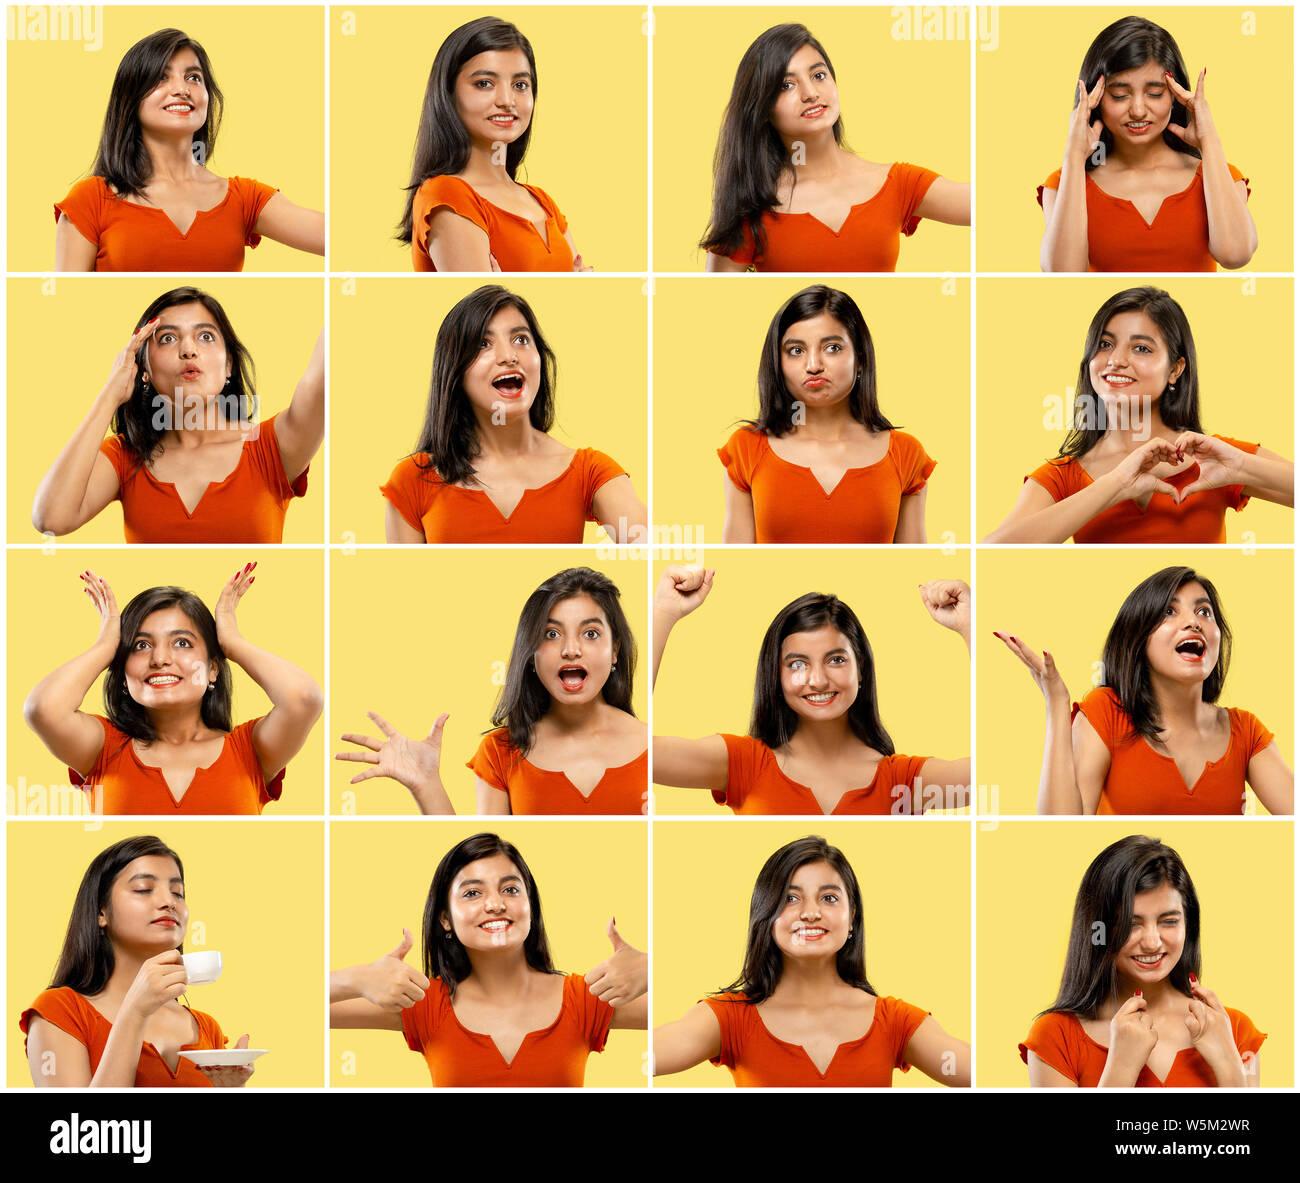 Indian Collage Girl Immagini e Fotos Stock Alamy